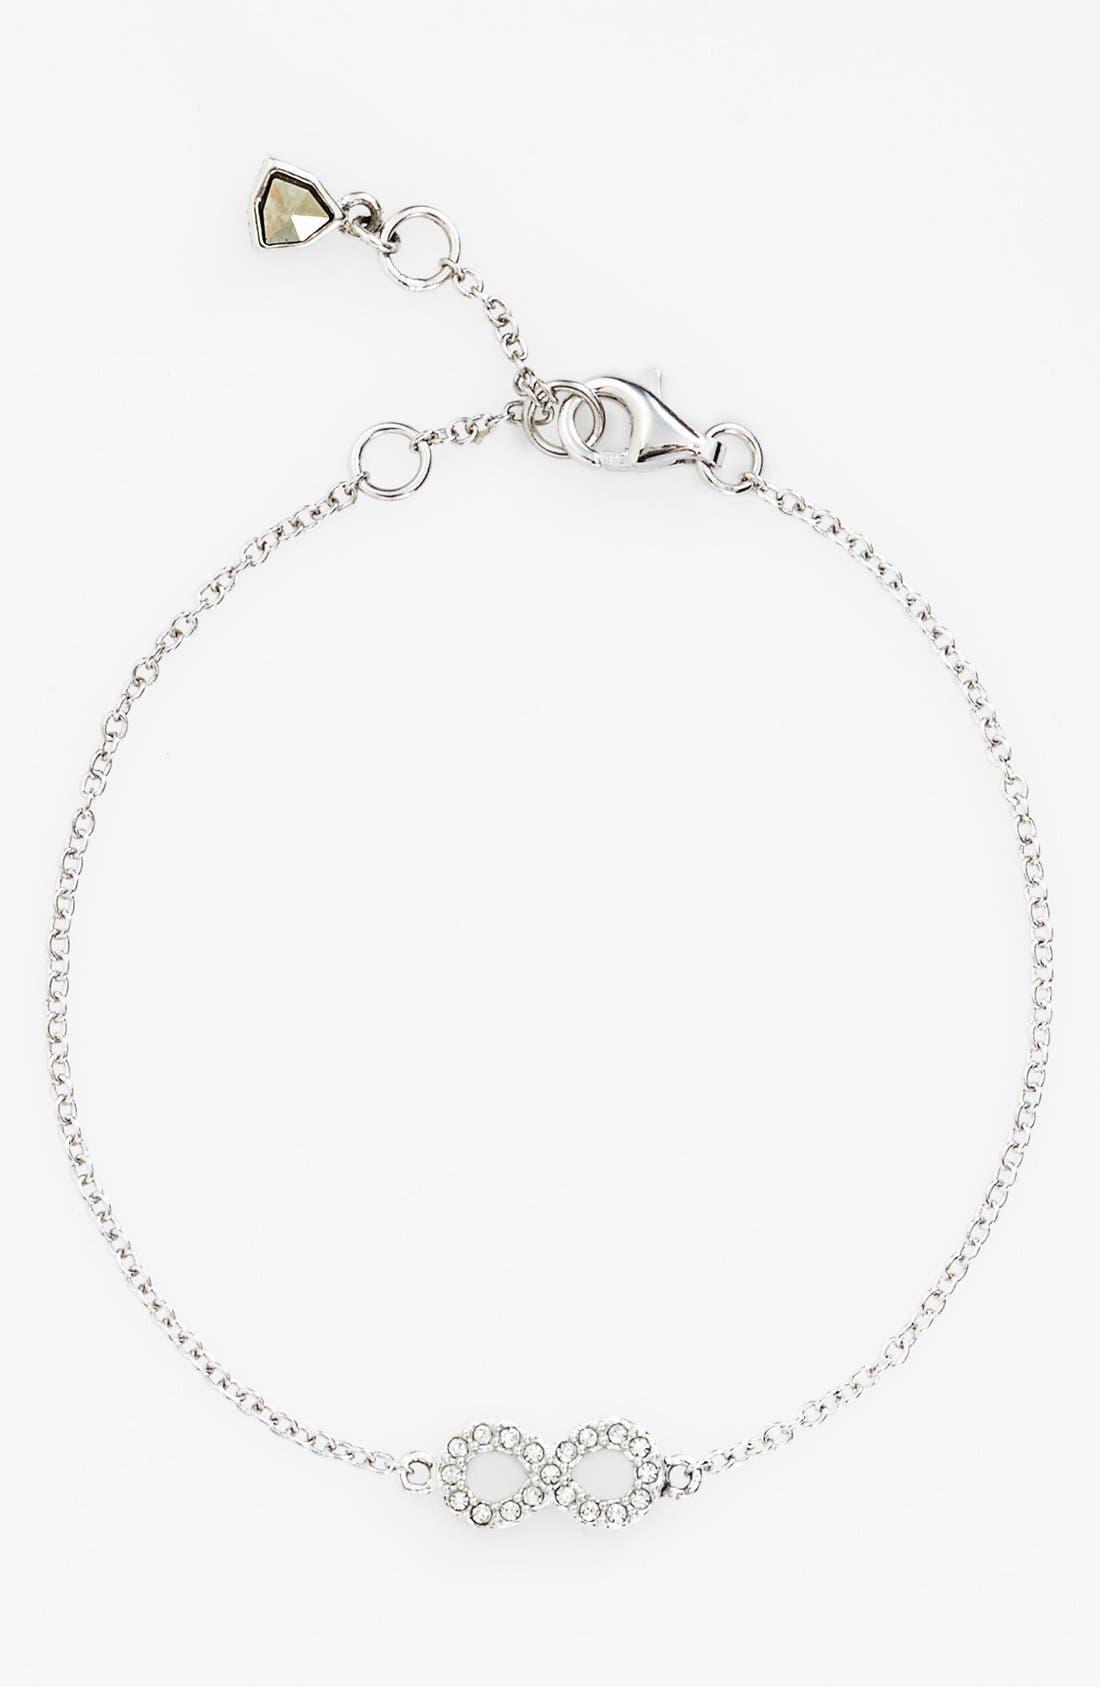 Alternate Image 1 Selected - Judith Jack 'Mini Motives' Infinity Symbol Station Bracelet